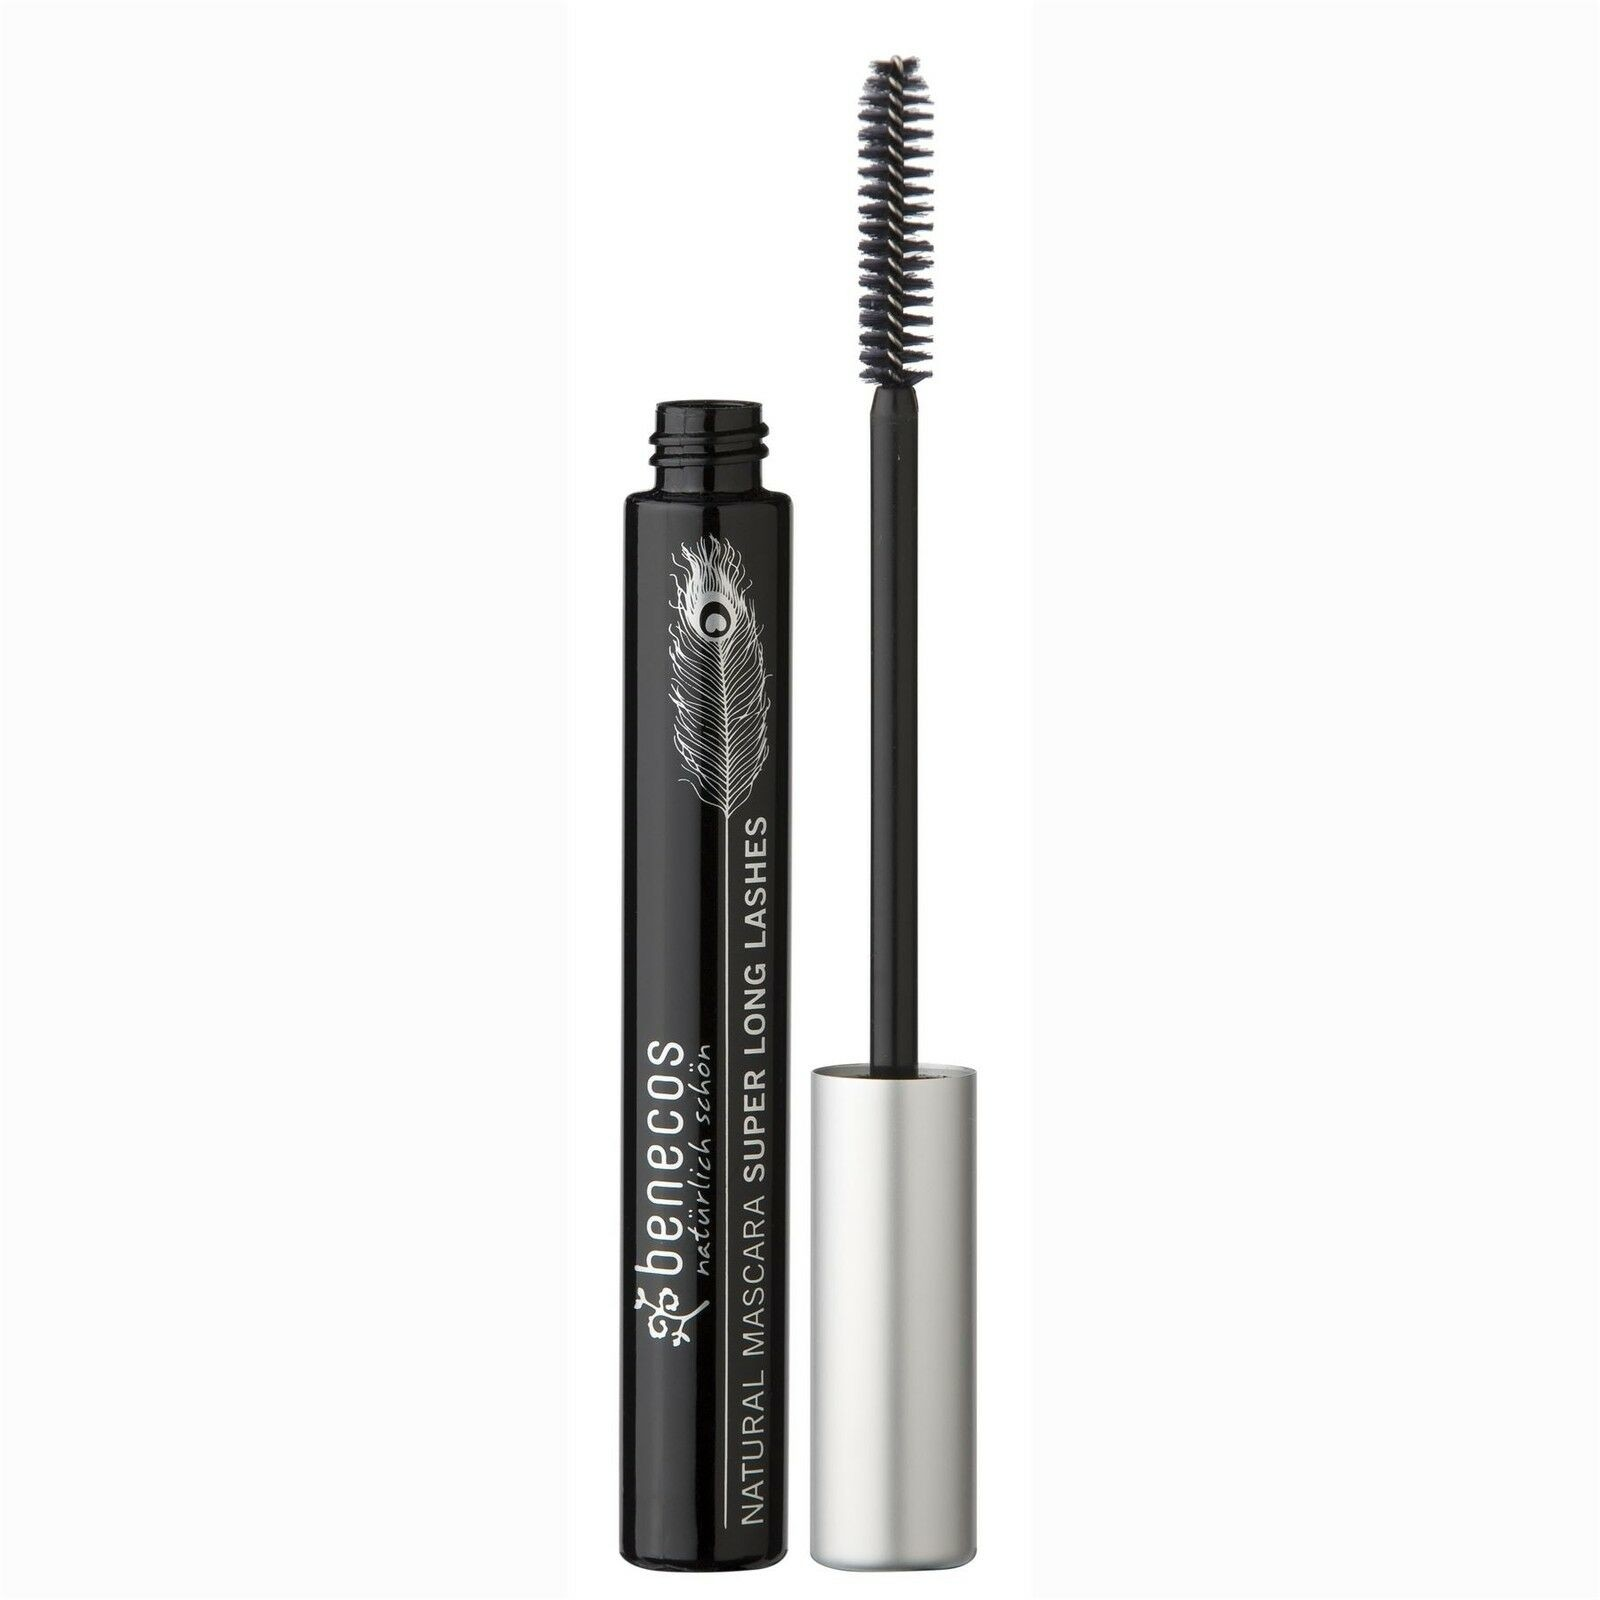 Benecos Natural Mascara Super Long Lashes Carbon Black